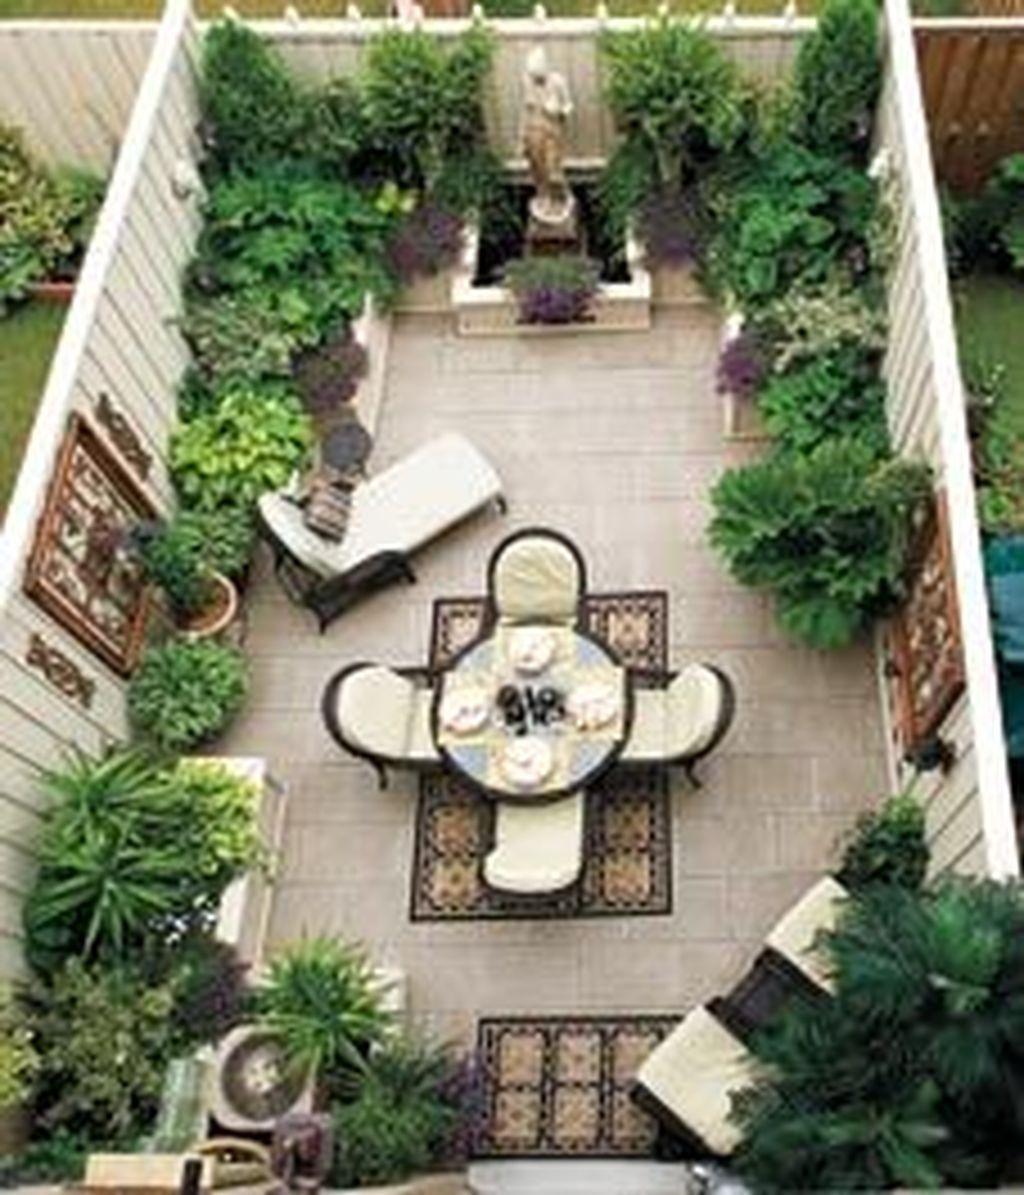 Mobile home garden tub  Small Deck Ideas  Decorating Porch Design On A Budget Space Saving